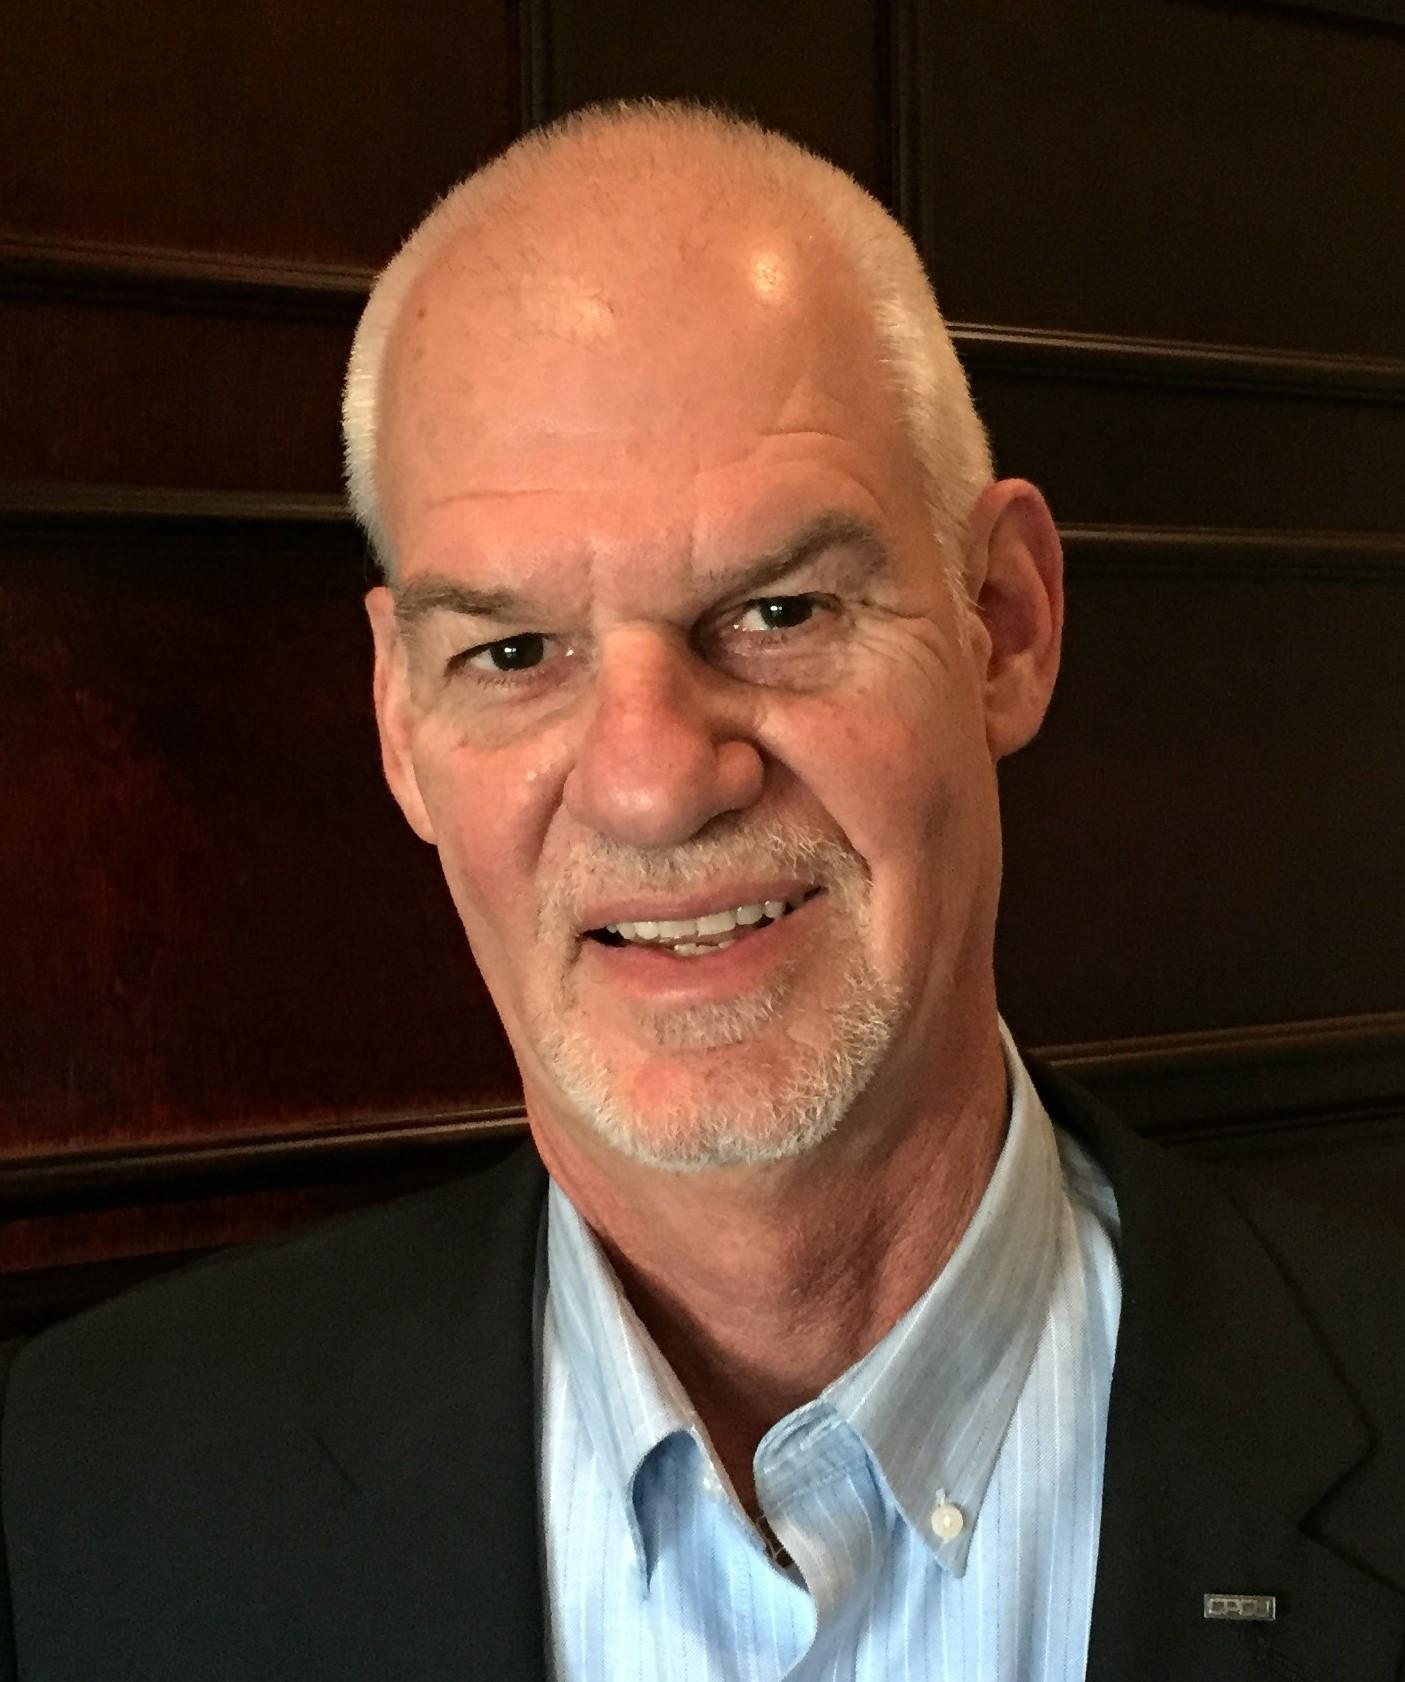 Dan Dyce, CPCU RPA - CRMP Governing Board, Board Member